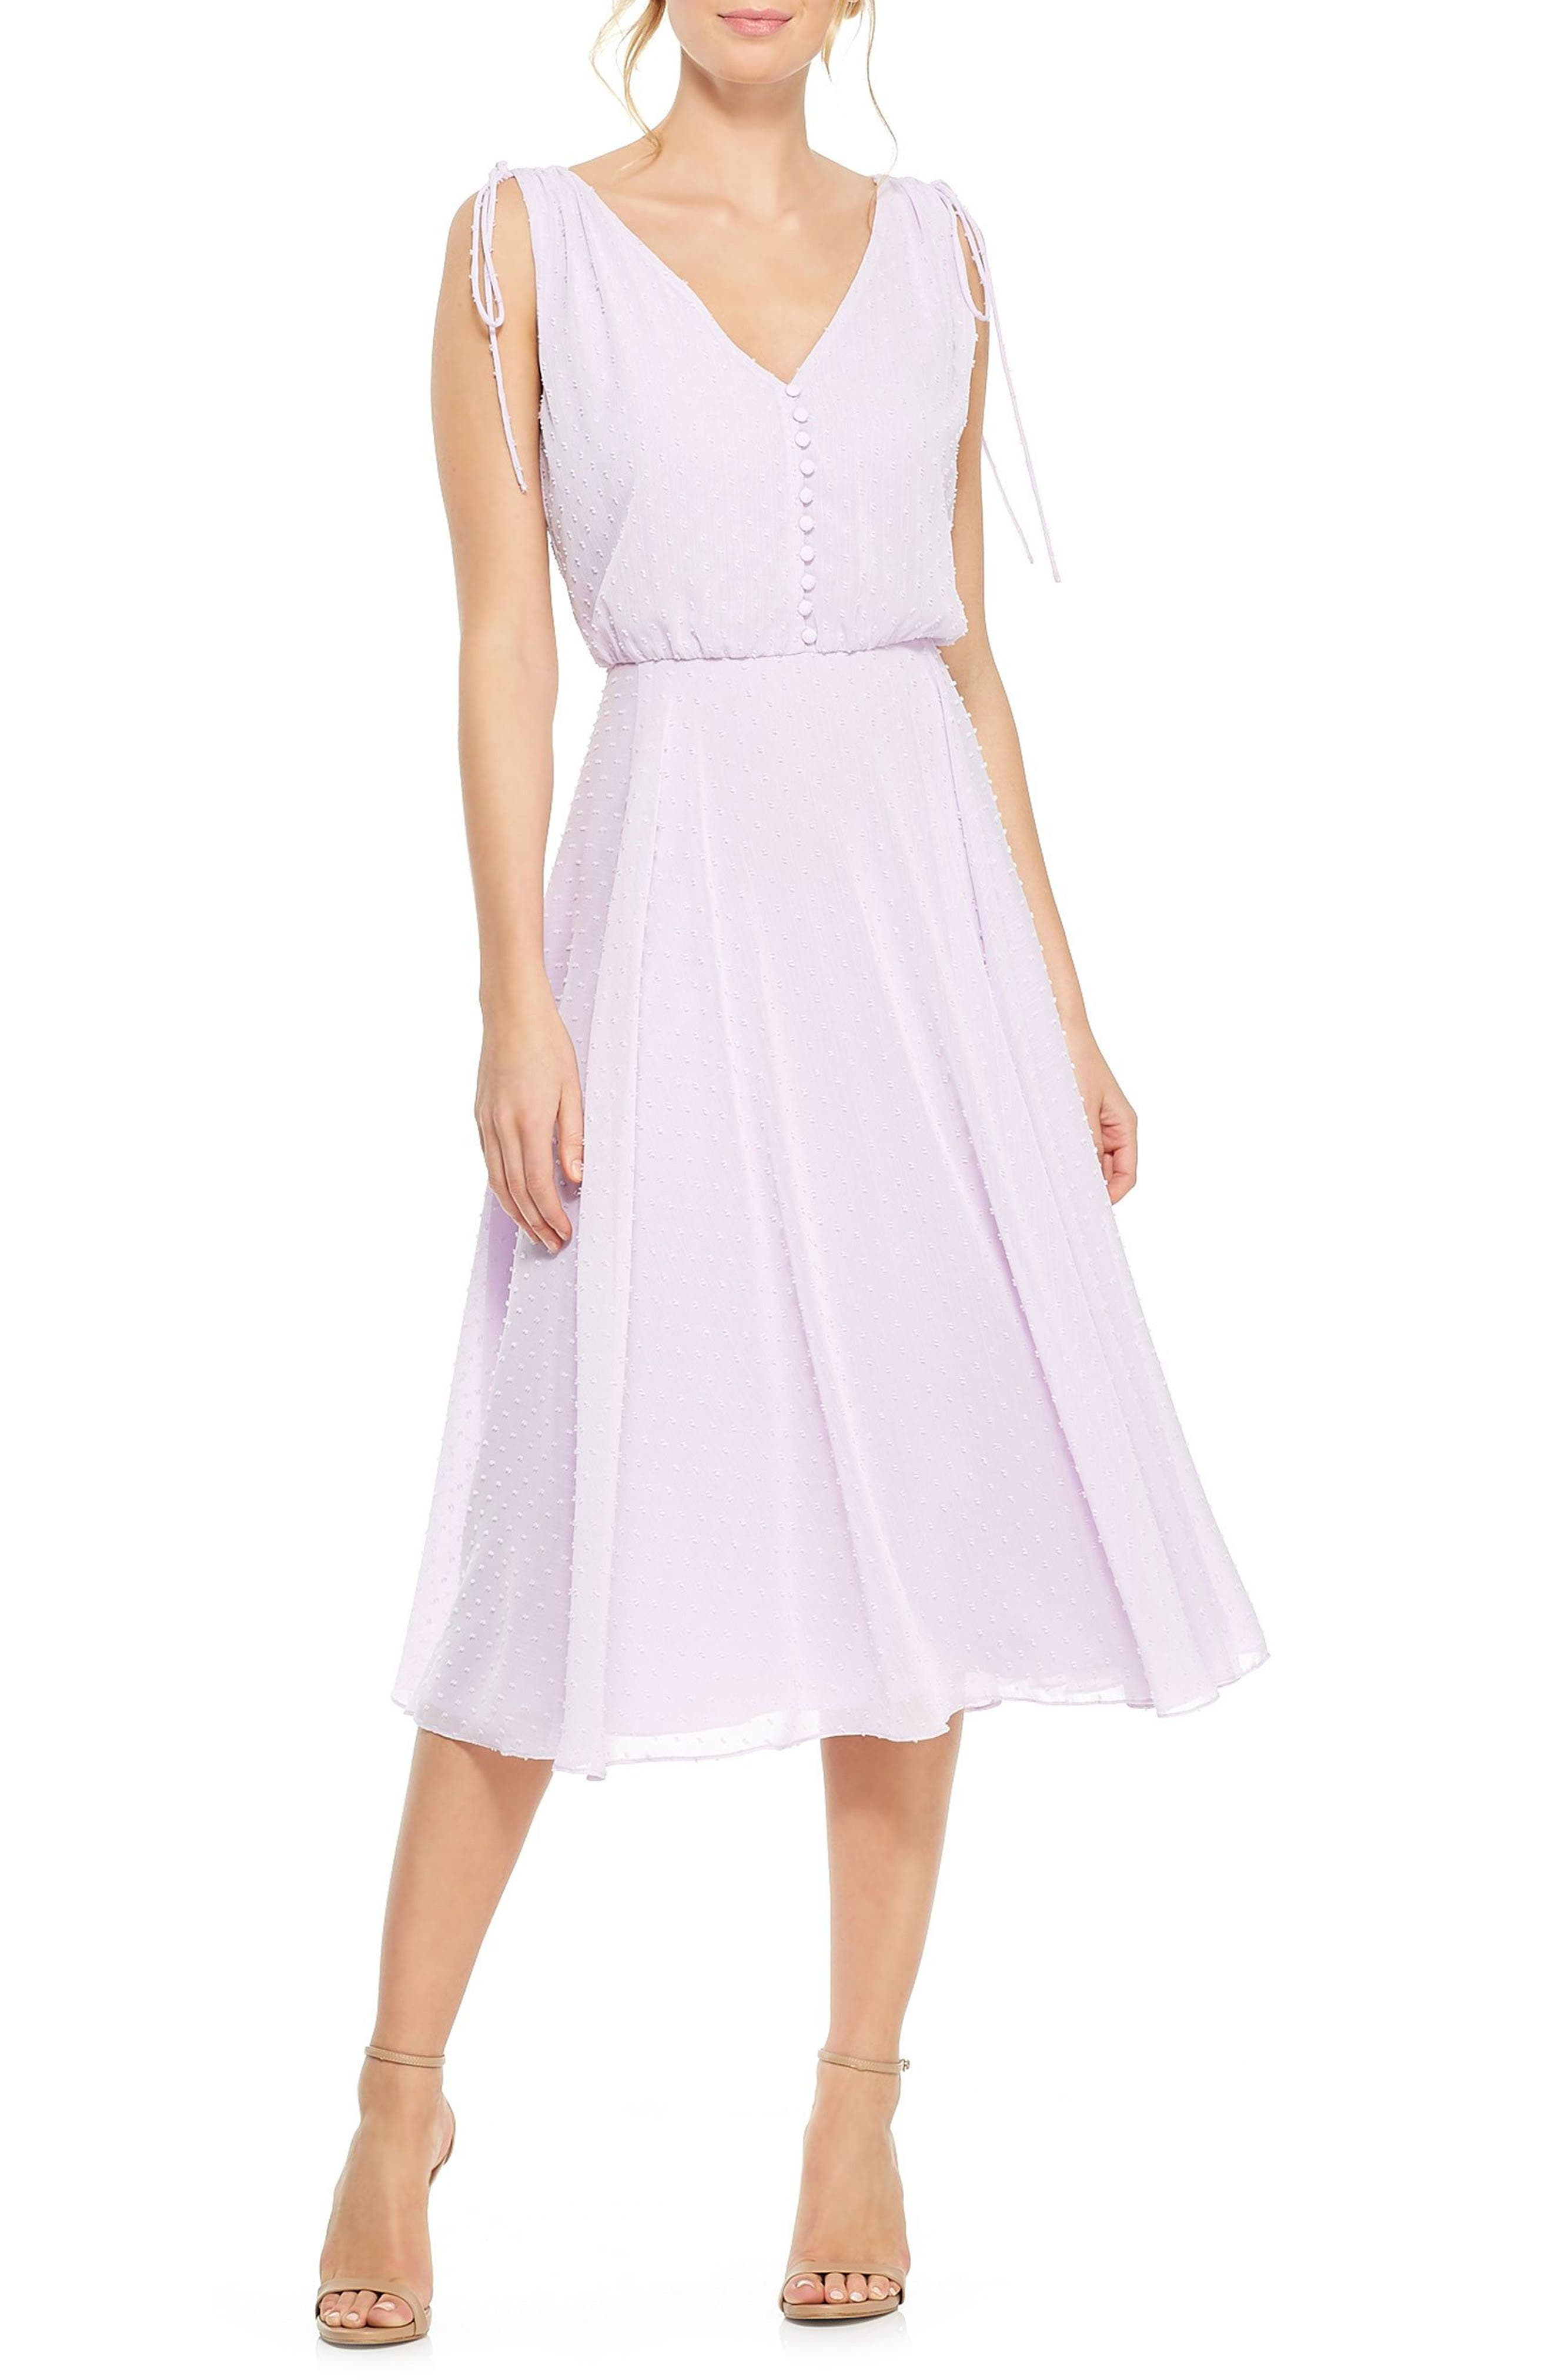 Gal Meets Glam Collection Hillary Clip Dot Chiffon Midi Dress, 0 (similar to 16W-18W) - Purple